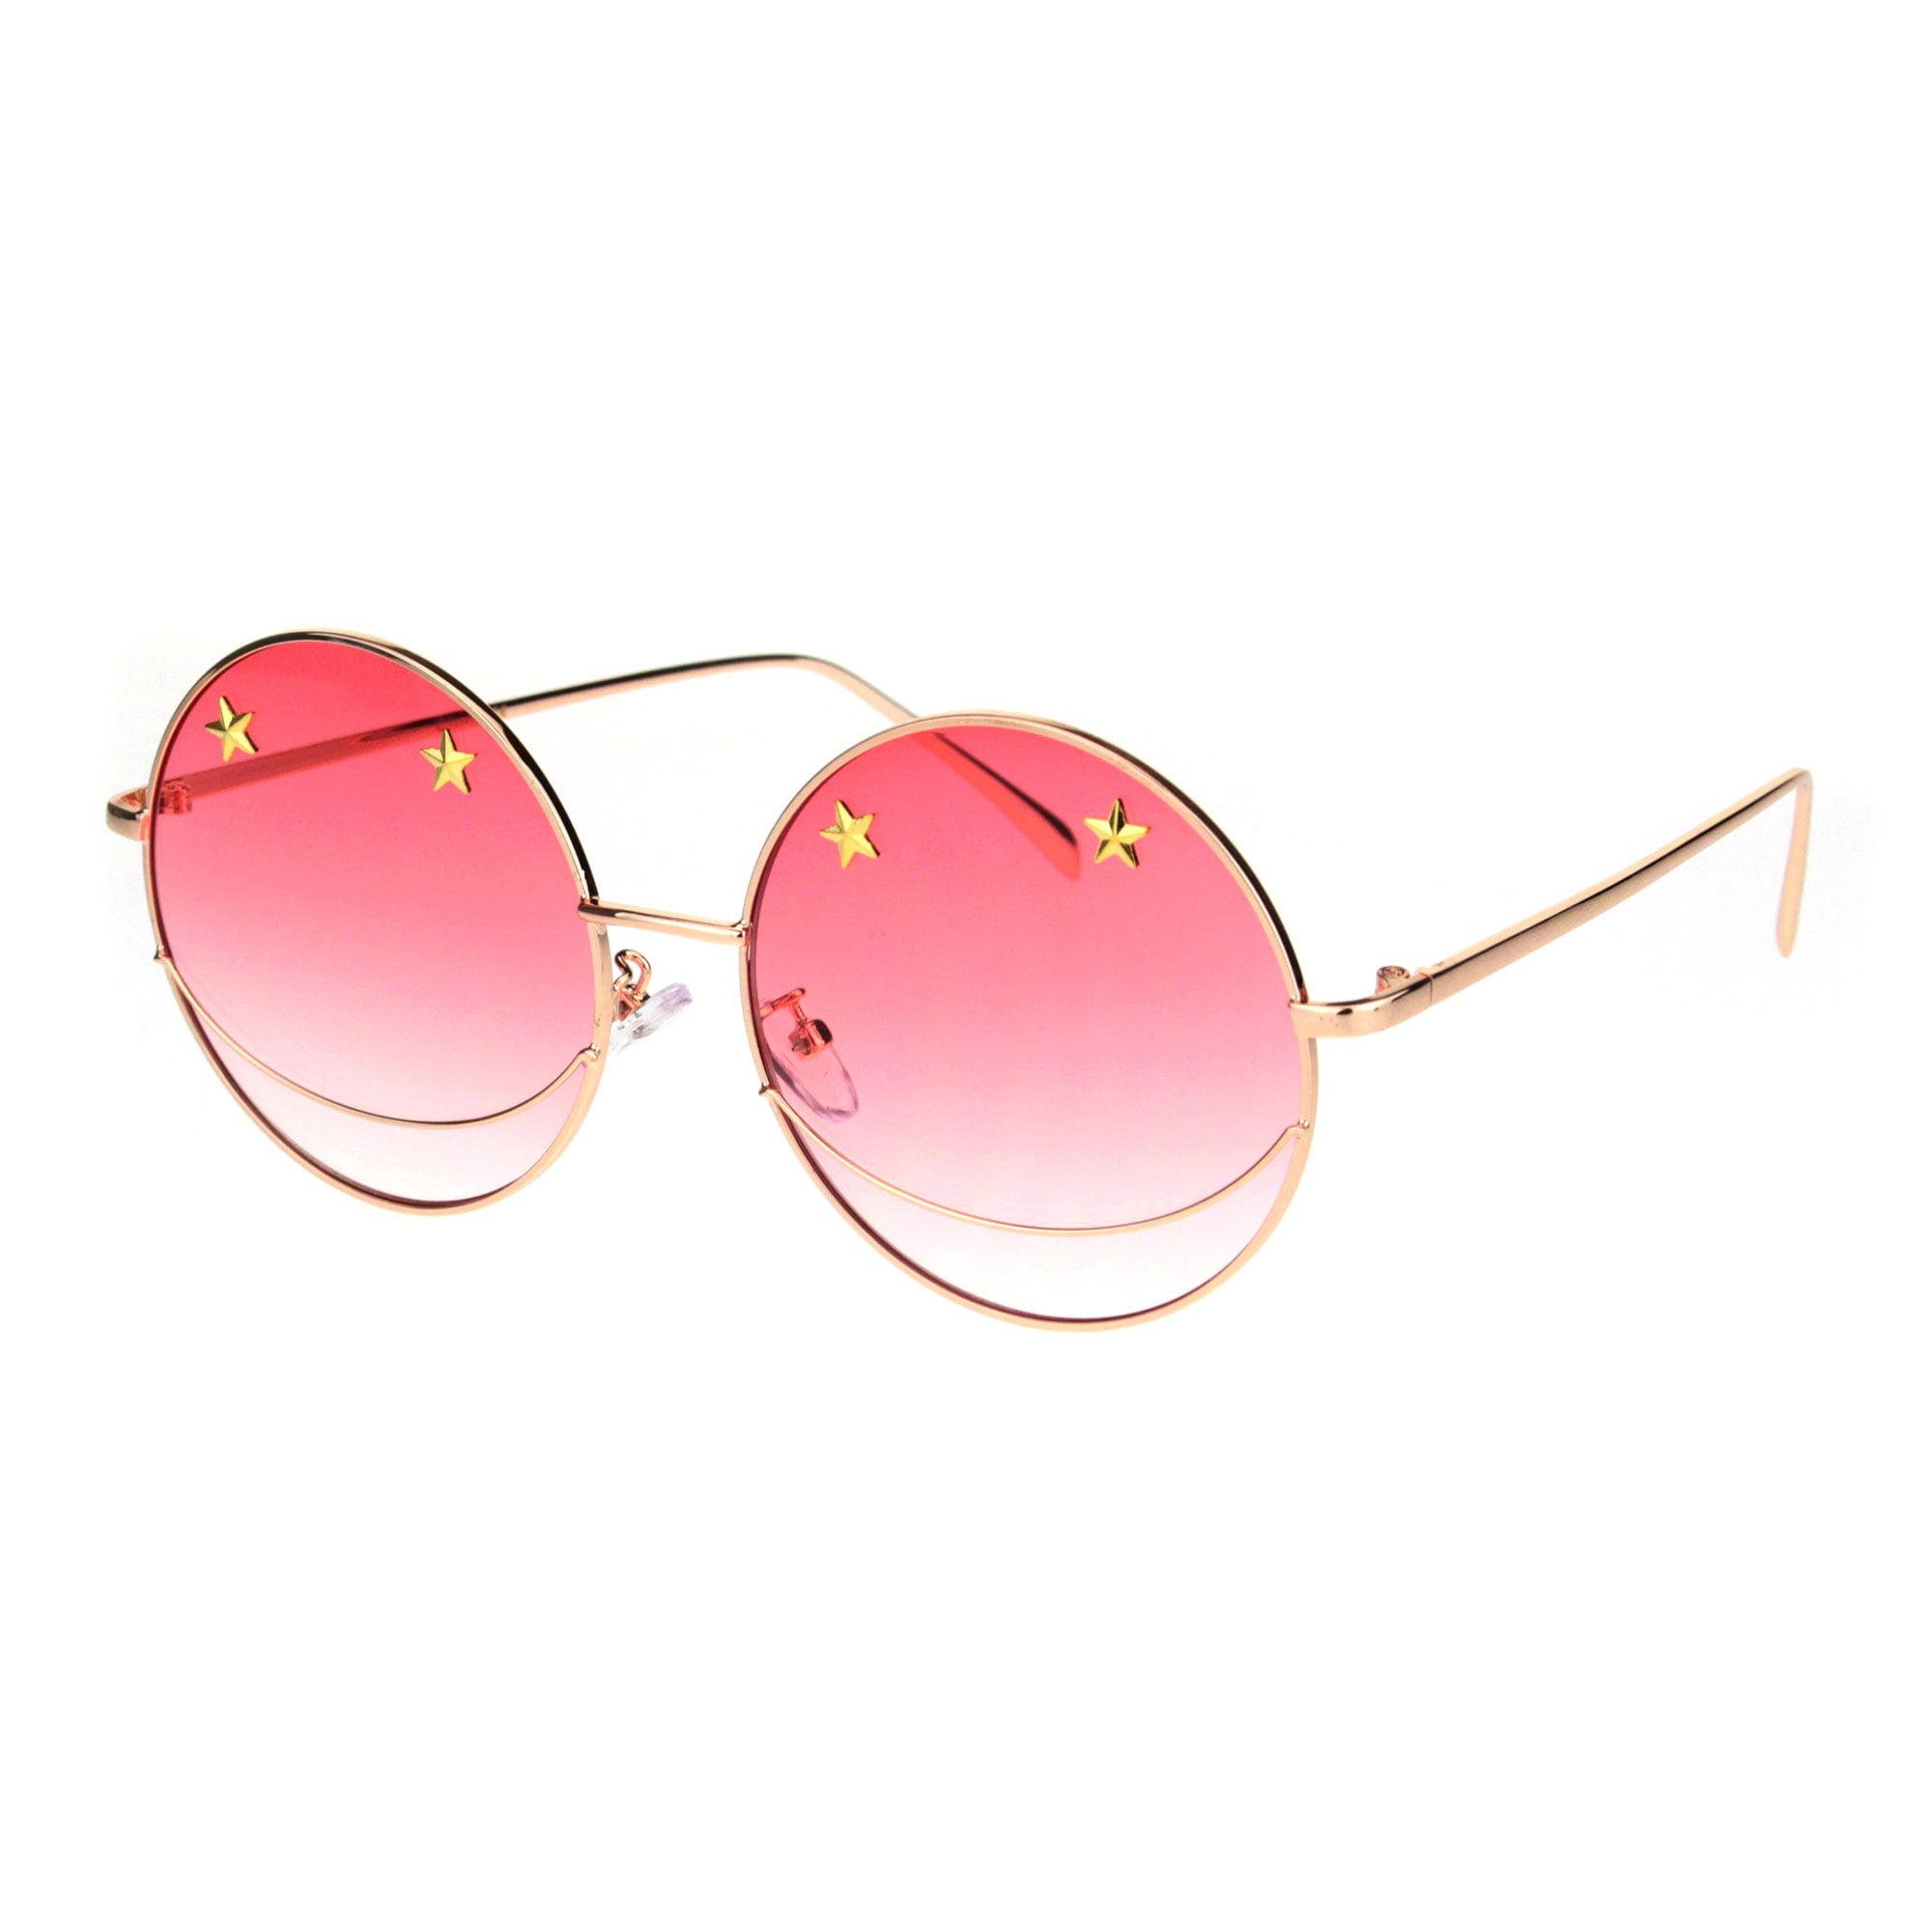 dea68413f9 Womens hippie smile round circle lens pimp retro metal sunglasses rose gold  red jpg 2000x2000 Red